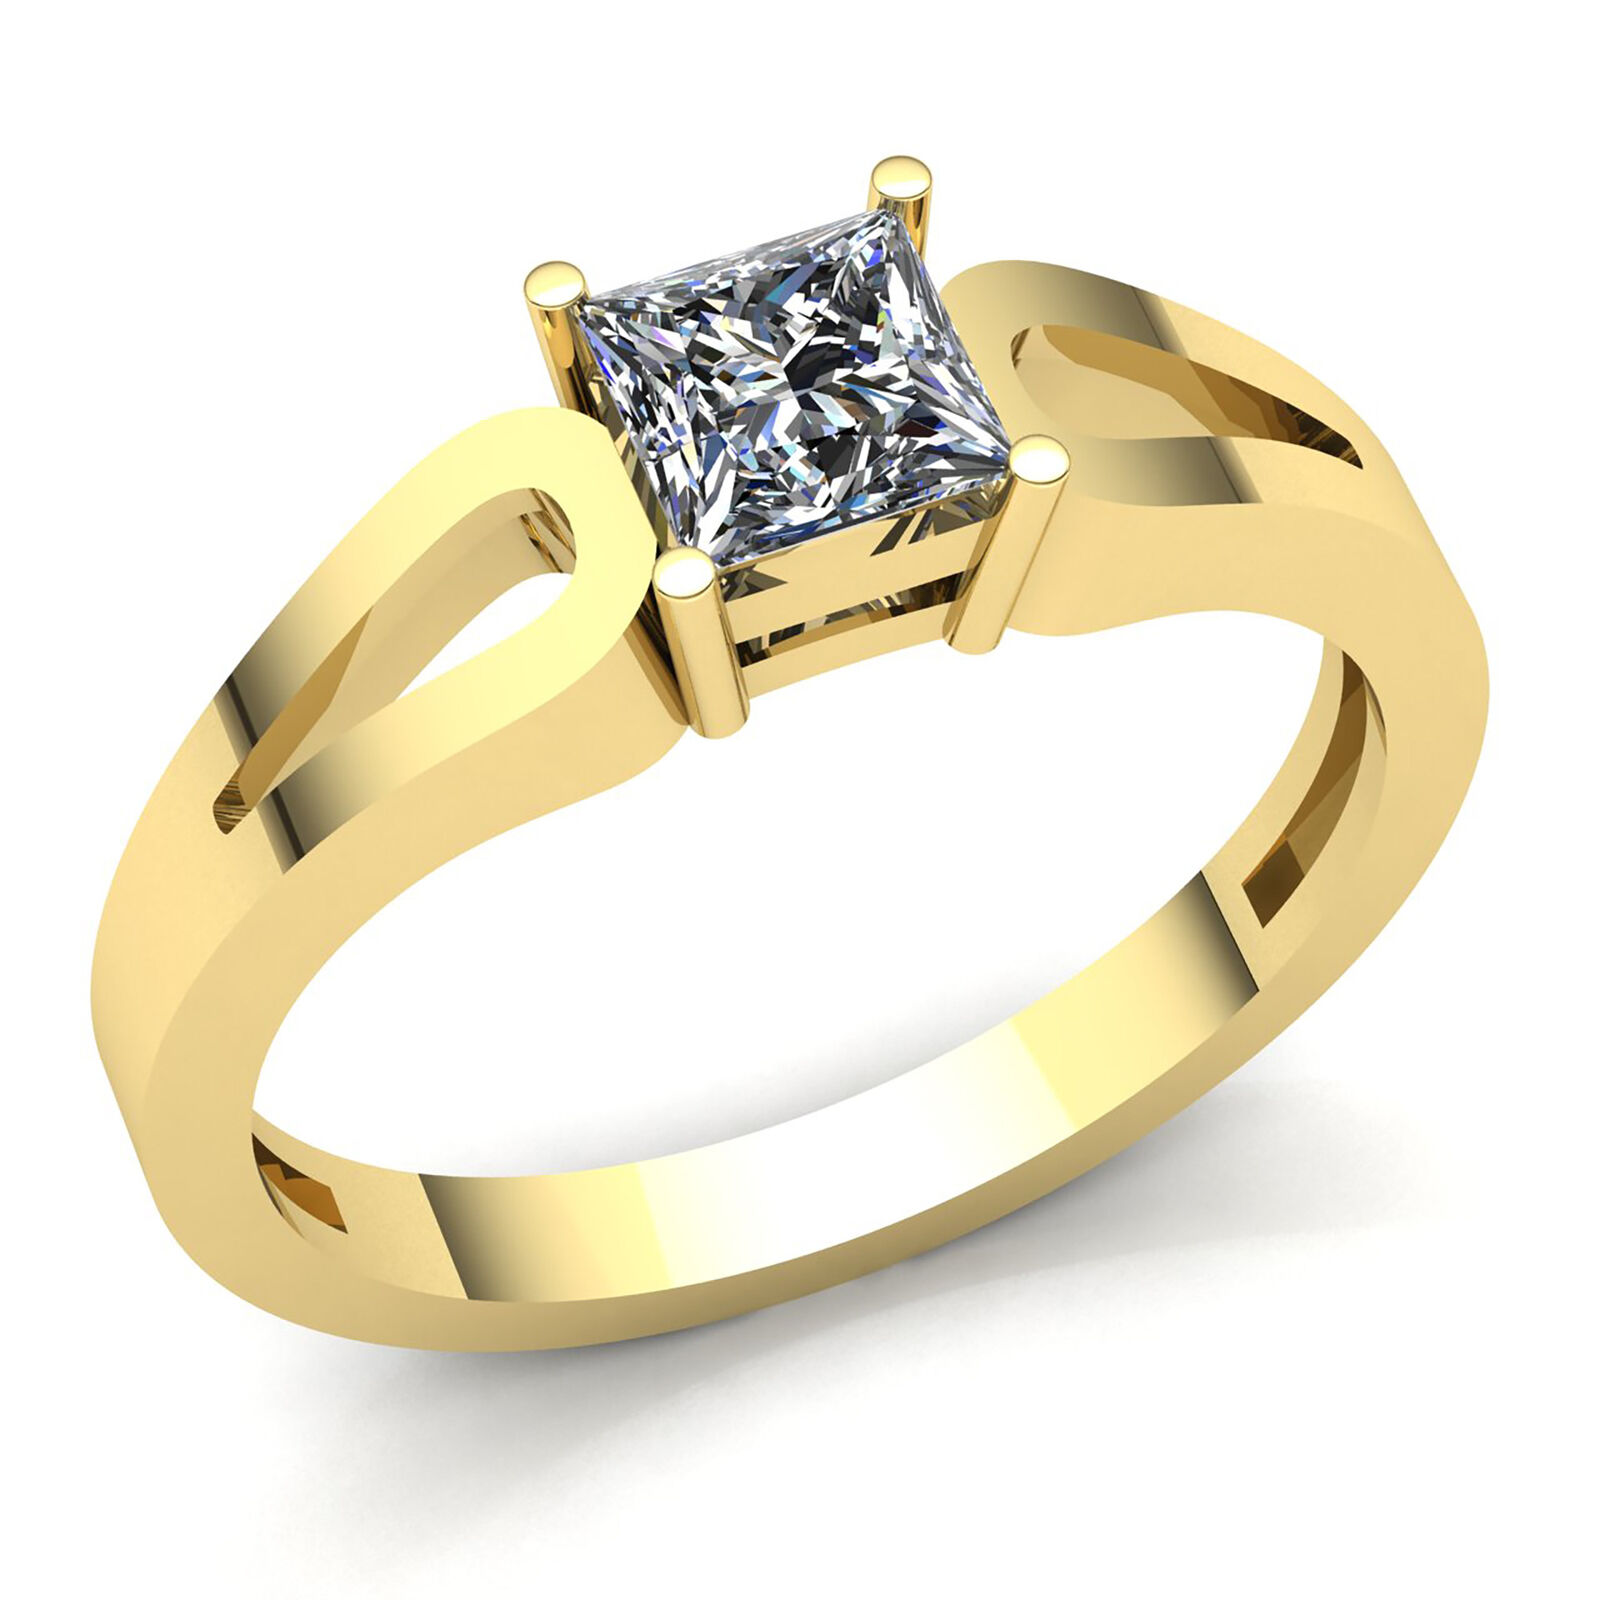 Real 0.6carat Princess Diamond Ladies Bridal Solitaire Engagement Ring 18K gold